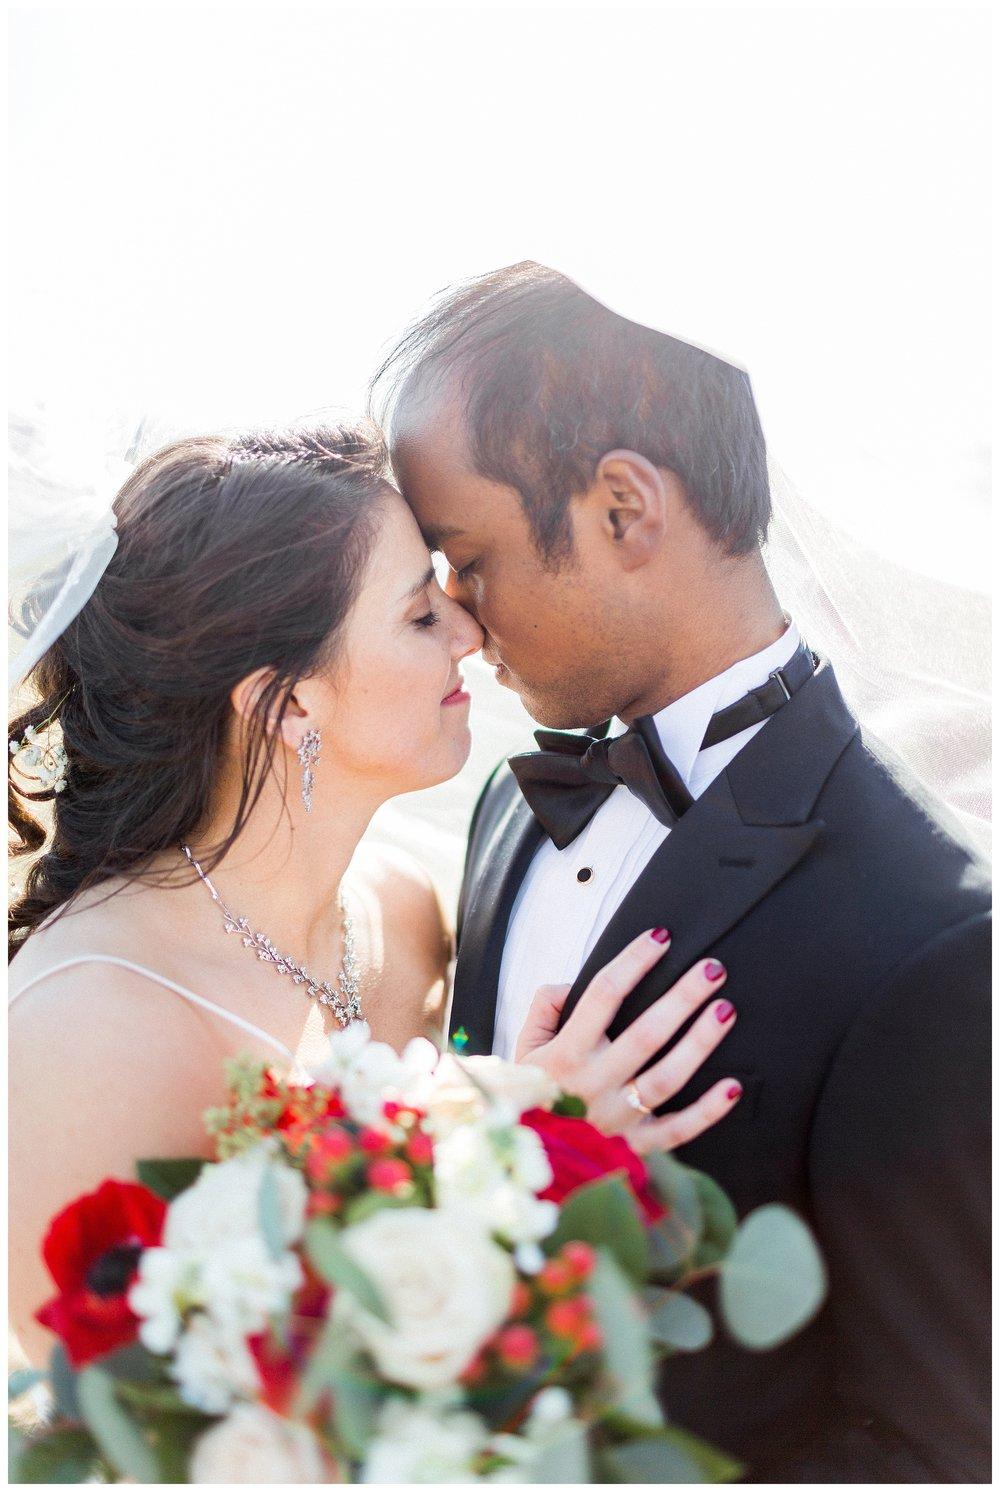 Stone Tower Winery Wedding | Virginia Winter Wedding | VA Wedding Photographer Kir Tuben_0001.jpg